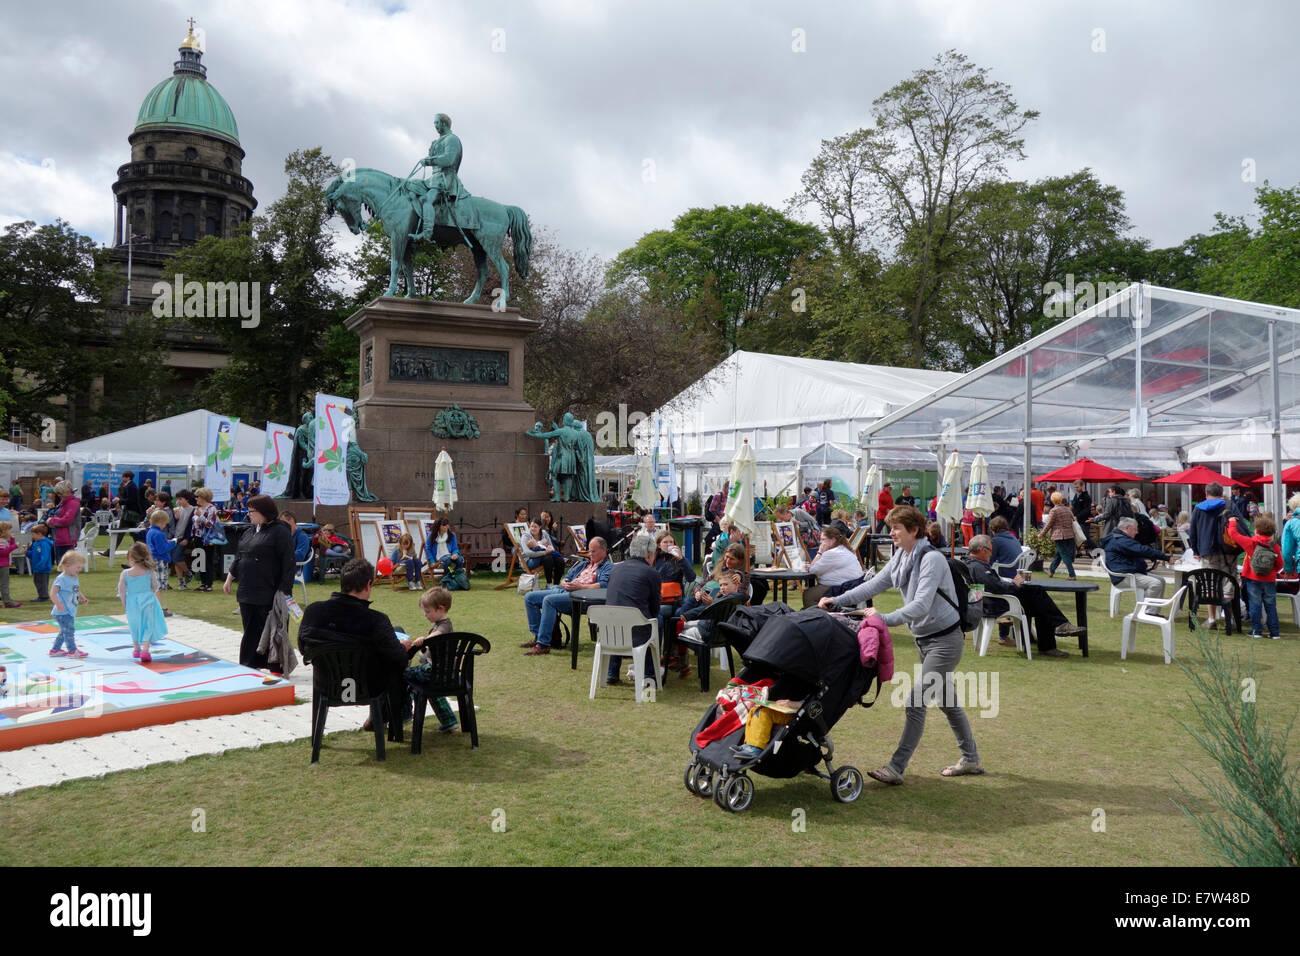 People in the gardens of the Edinburgh International Book Festival - Stock Image